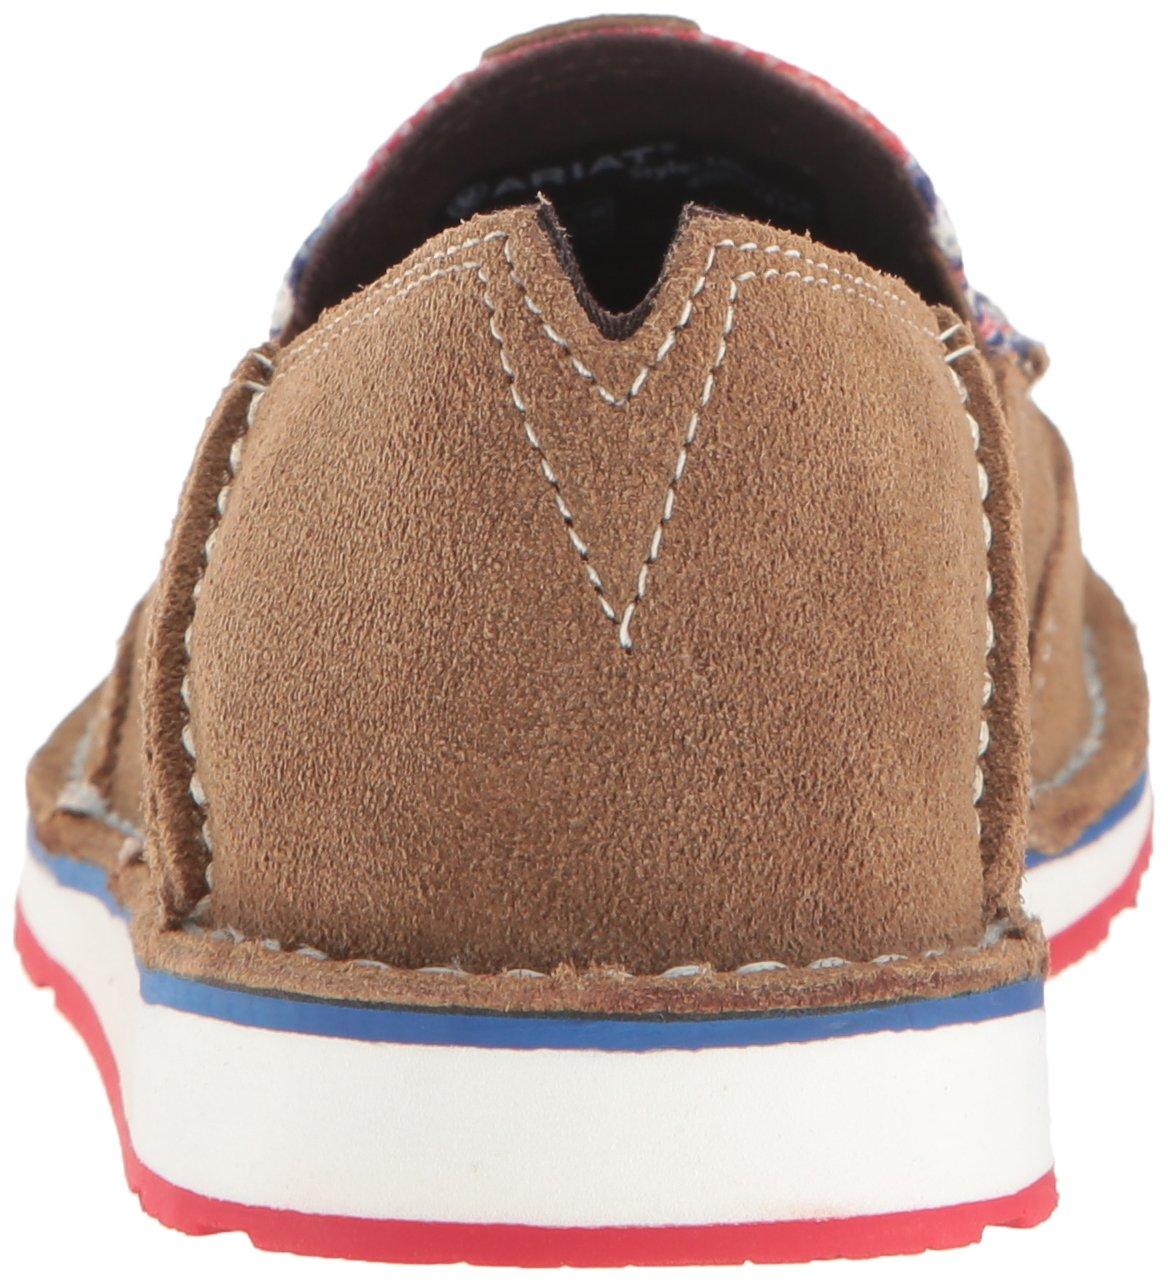 Ariat Women's Cruiser Slip-on Shoe B01MRBJ25I 5.5 B(M) US|Dirty Tan Suede